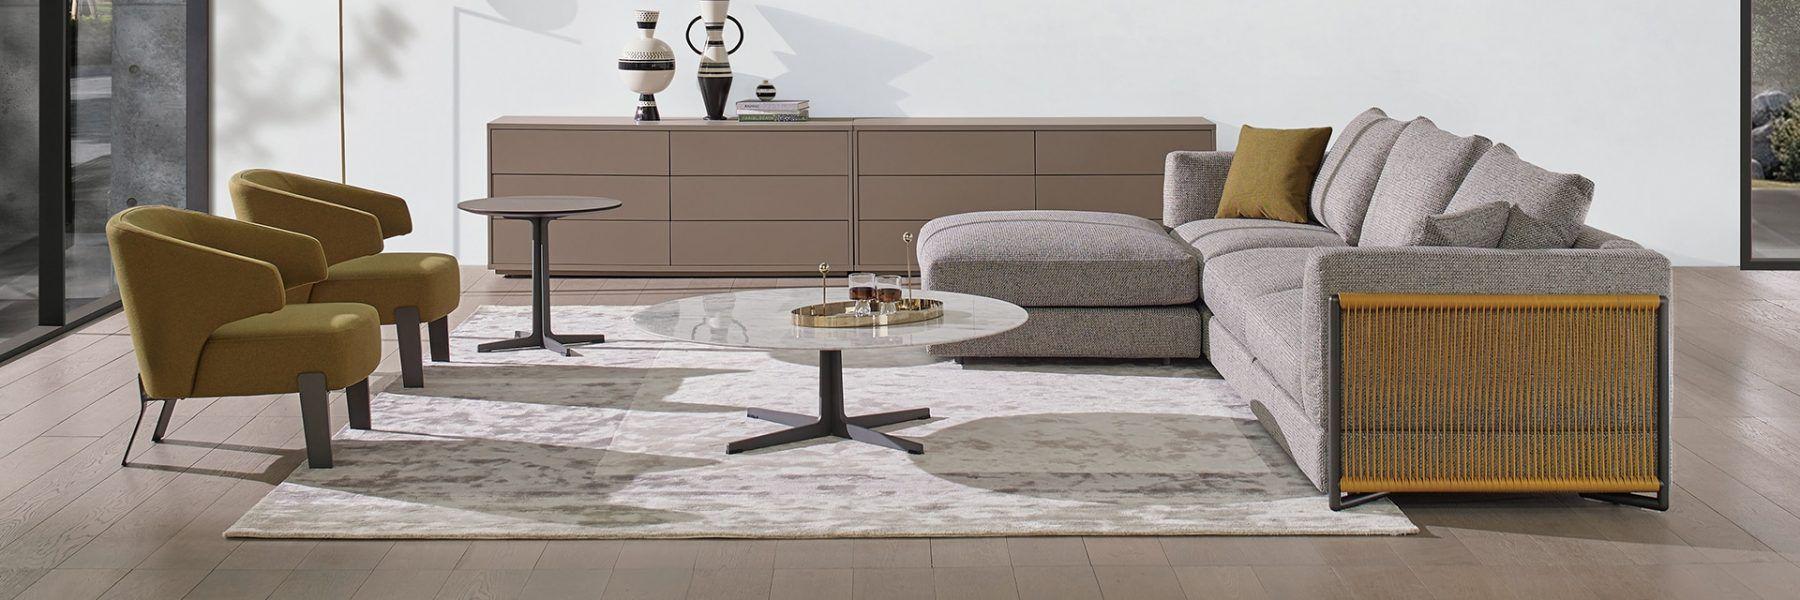 RM Living Cincinnati Interior Design Furniture By Camerich